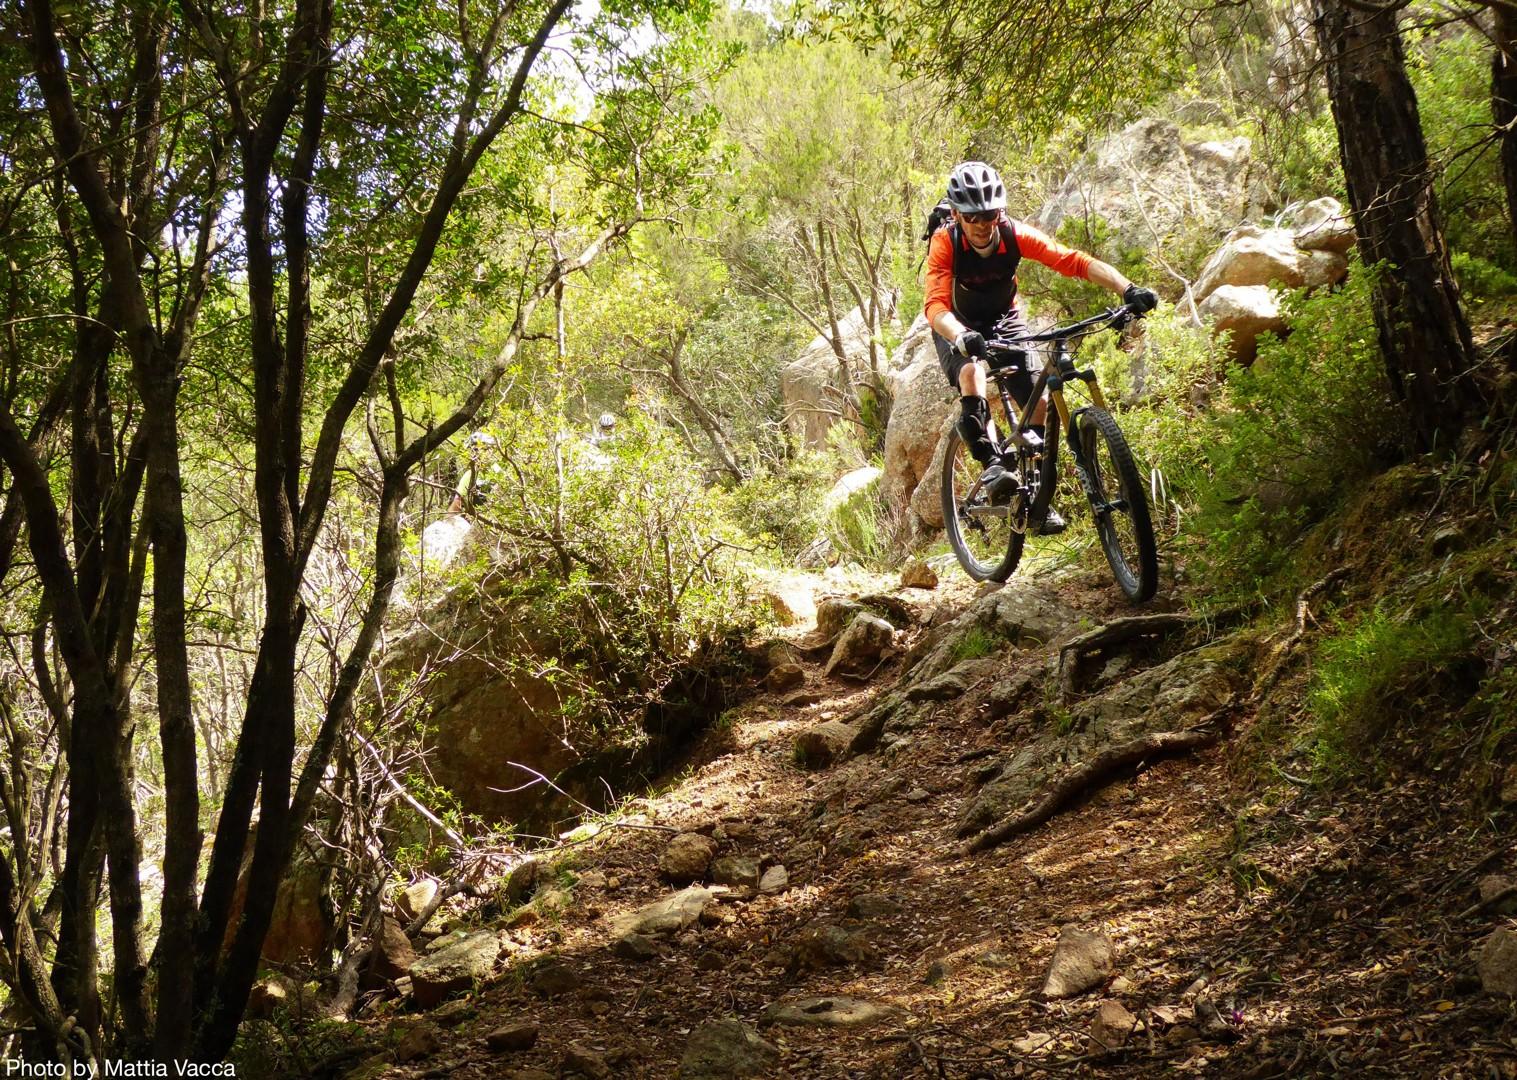 pula-enduro-in-italy-sardinia-mountain-bike-holiday.jpg - Sardinia - Sardinian Enduro - Guided Mountain Bike Holiday - Italia Mountain Biking